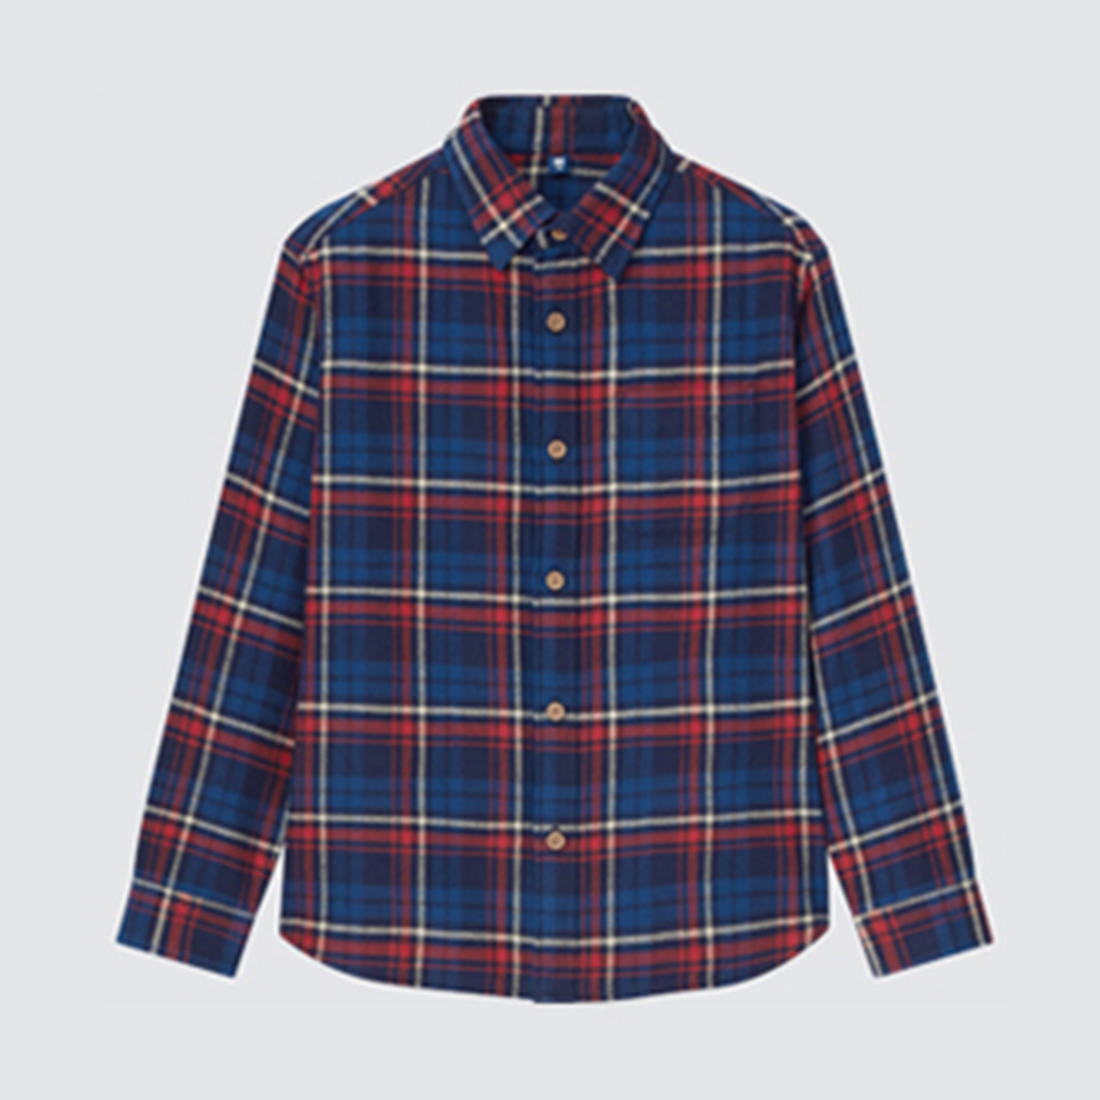 KIDS플란넬체크셔츠